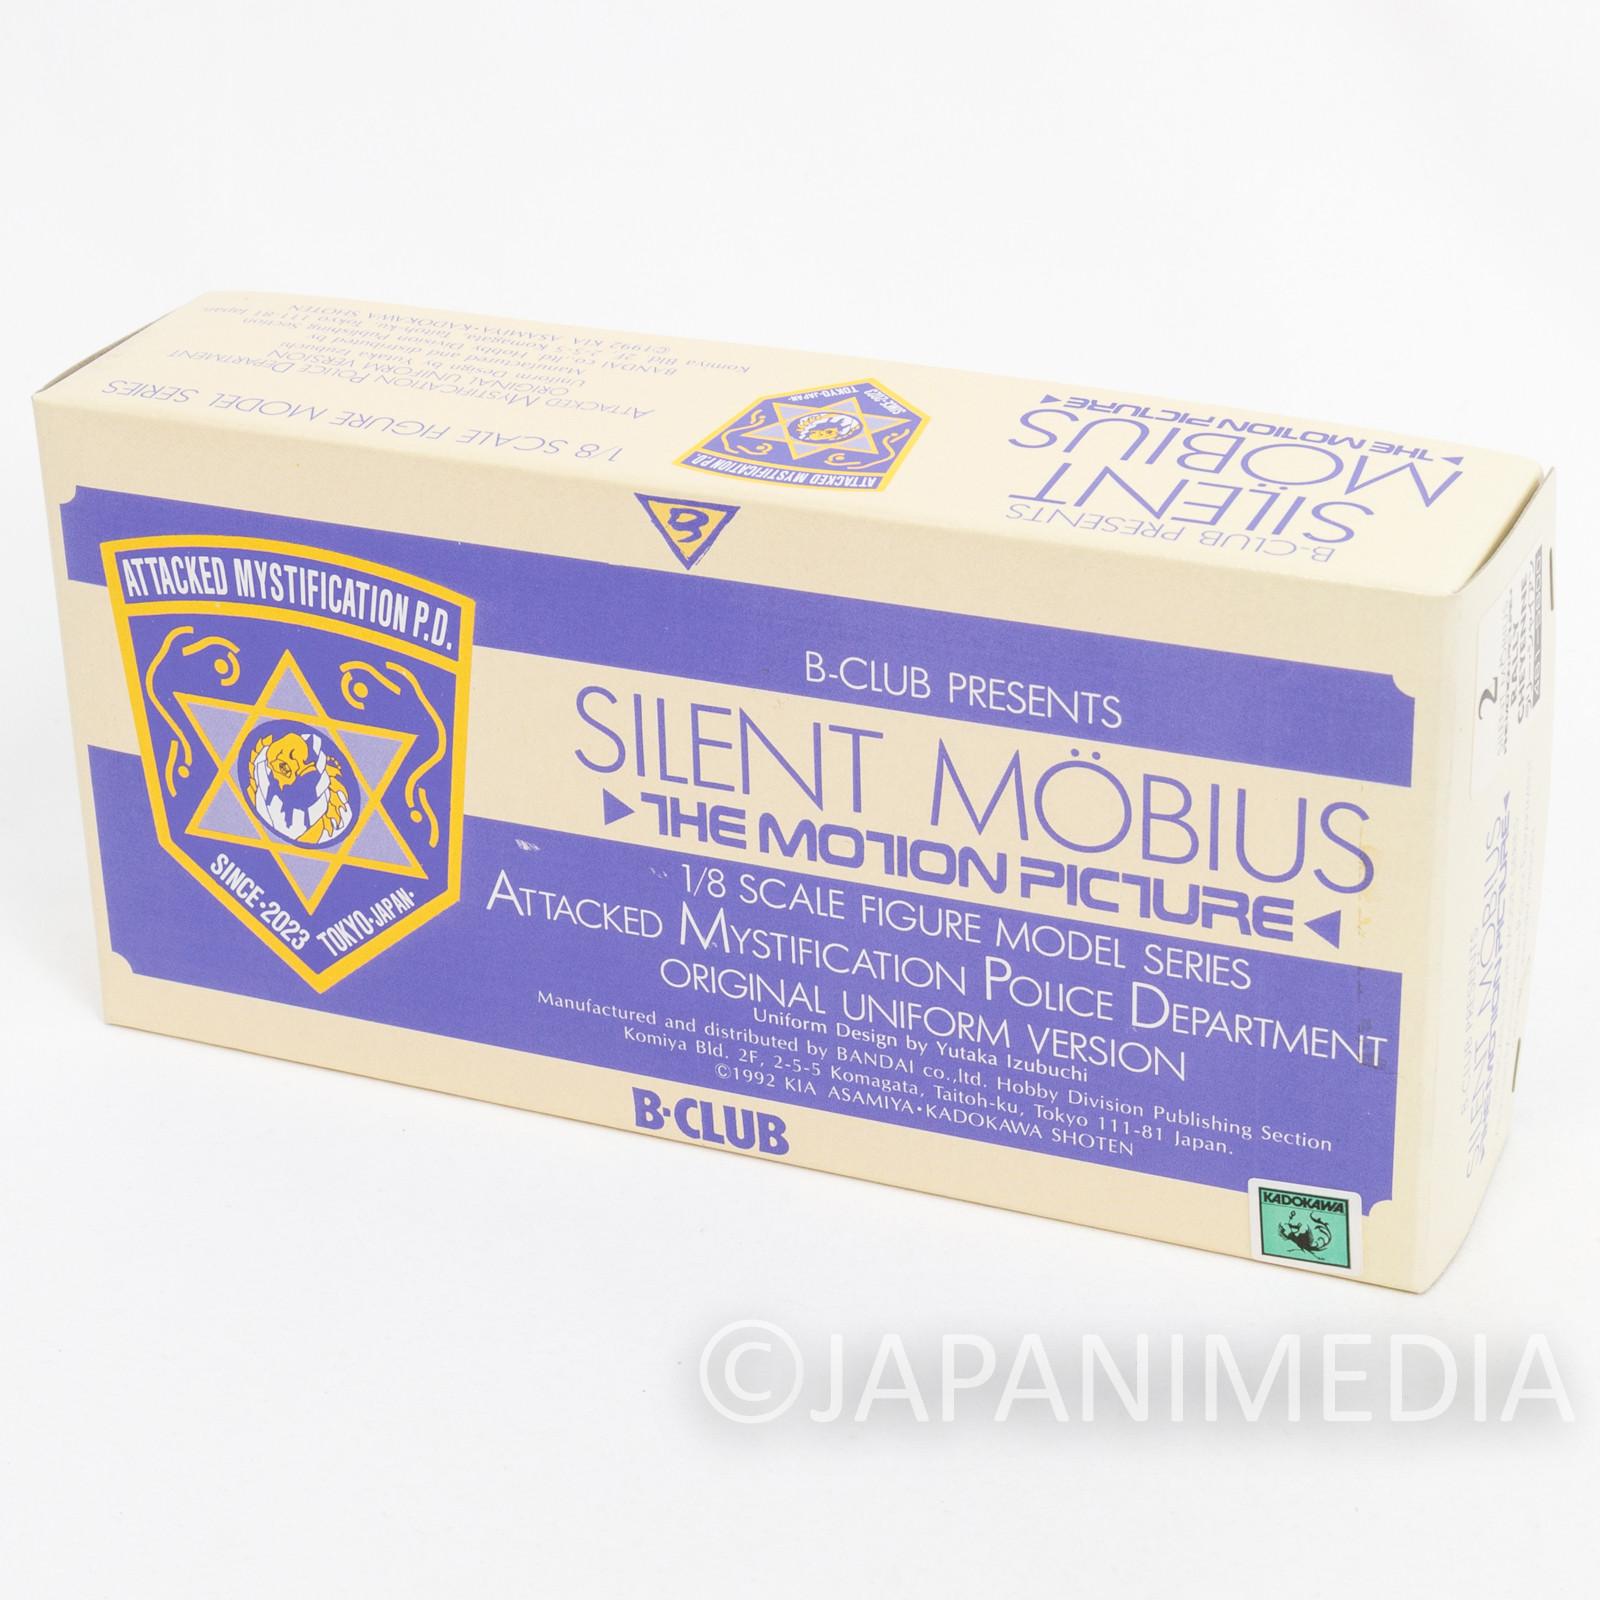 Silent Mobius Rally Cheyenne Resin Cast Model Kit 1/8 Scale B-Club JAPAN